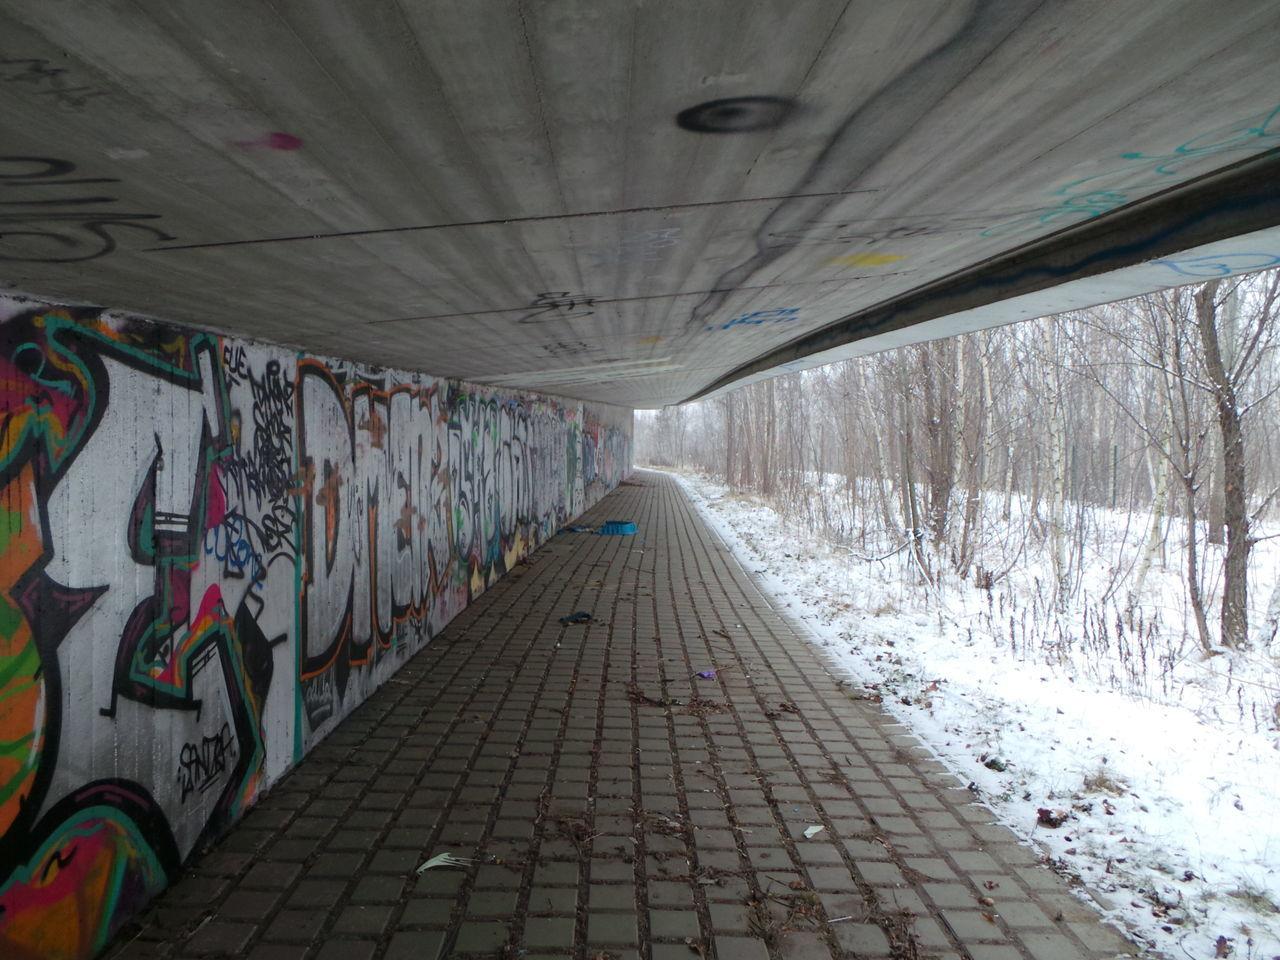 Architecture Architektur Bridge Brücke Bäume Cold Graffiti Kalt Perspective Schnee Snow Trees Walkway Way Weg Winter